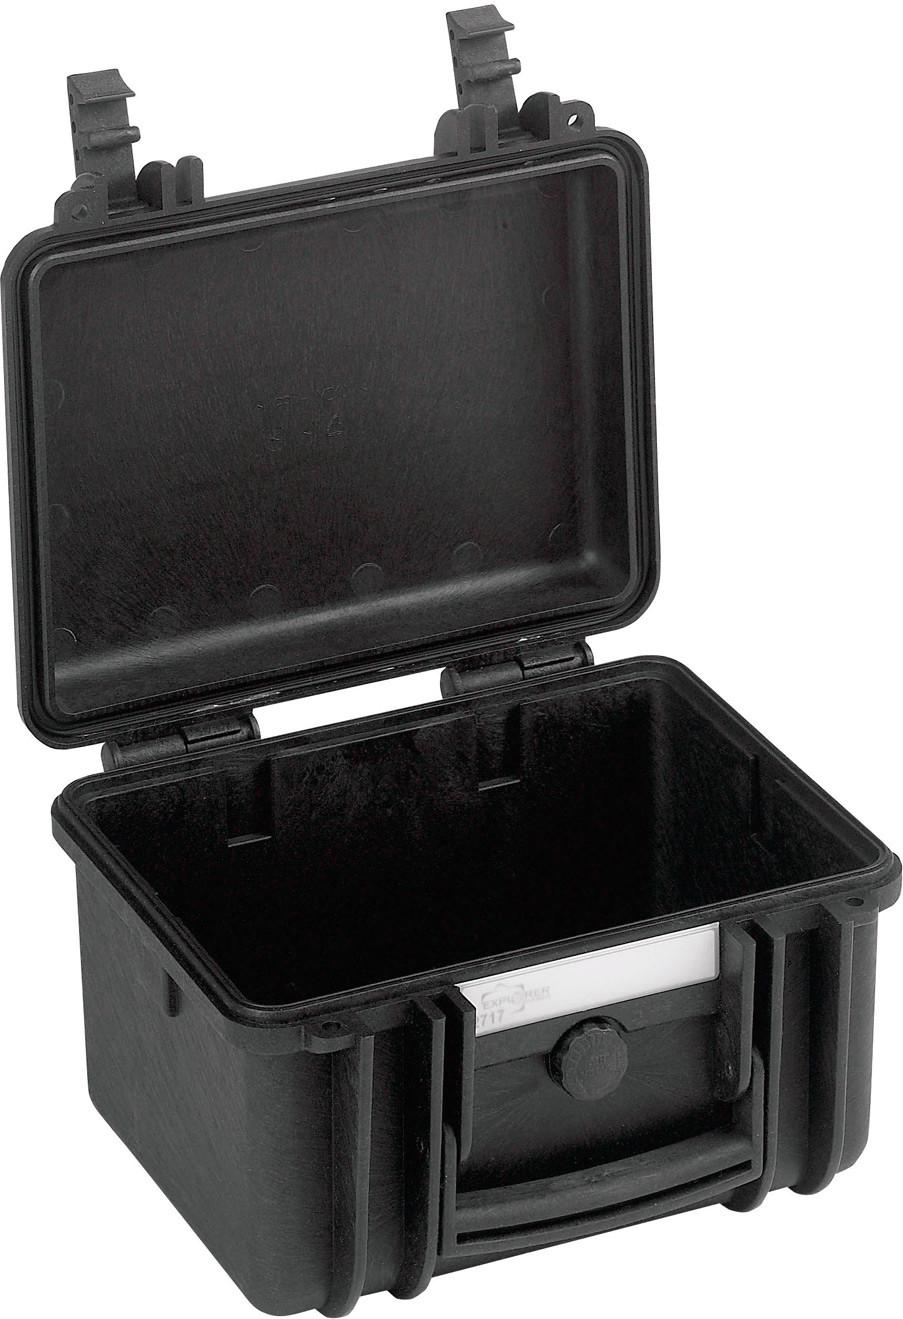 Image of Explorer Cases 2717